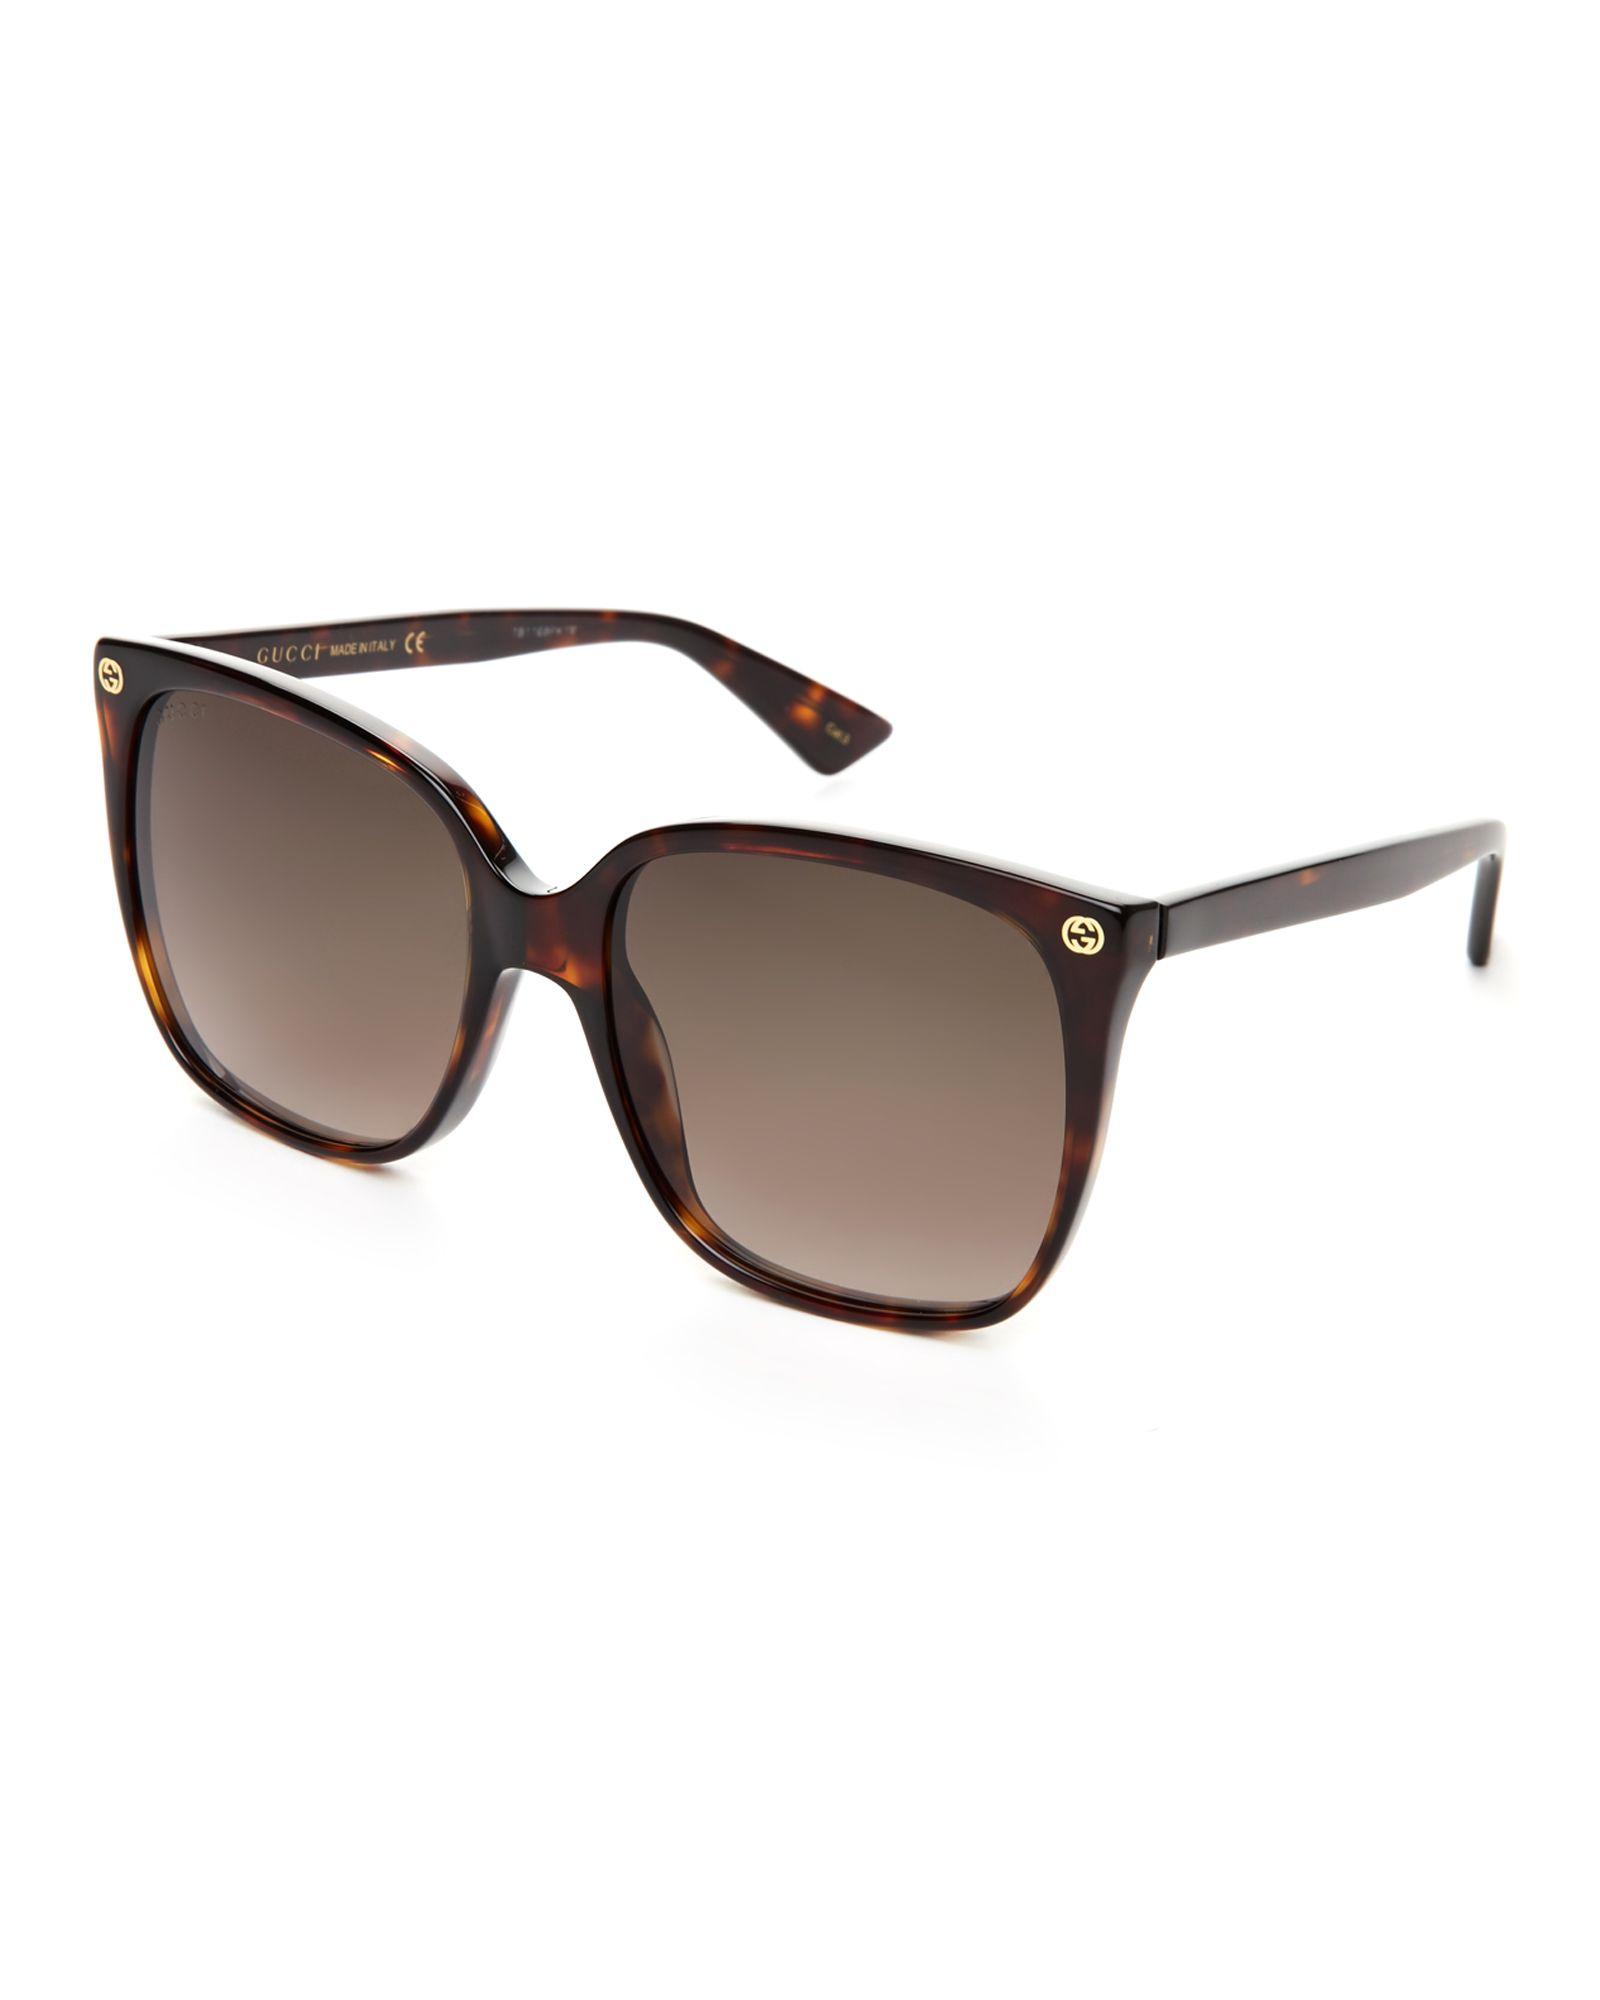 Gucci Gg 0022 S Tortoiseshell Look Xl Square Sunglasses Fashion Eye Glasses Square Sunglasses Sunglasses